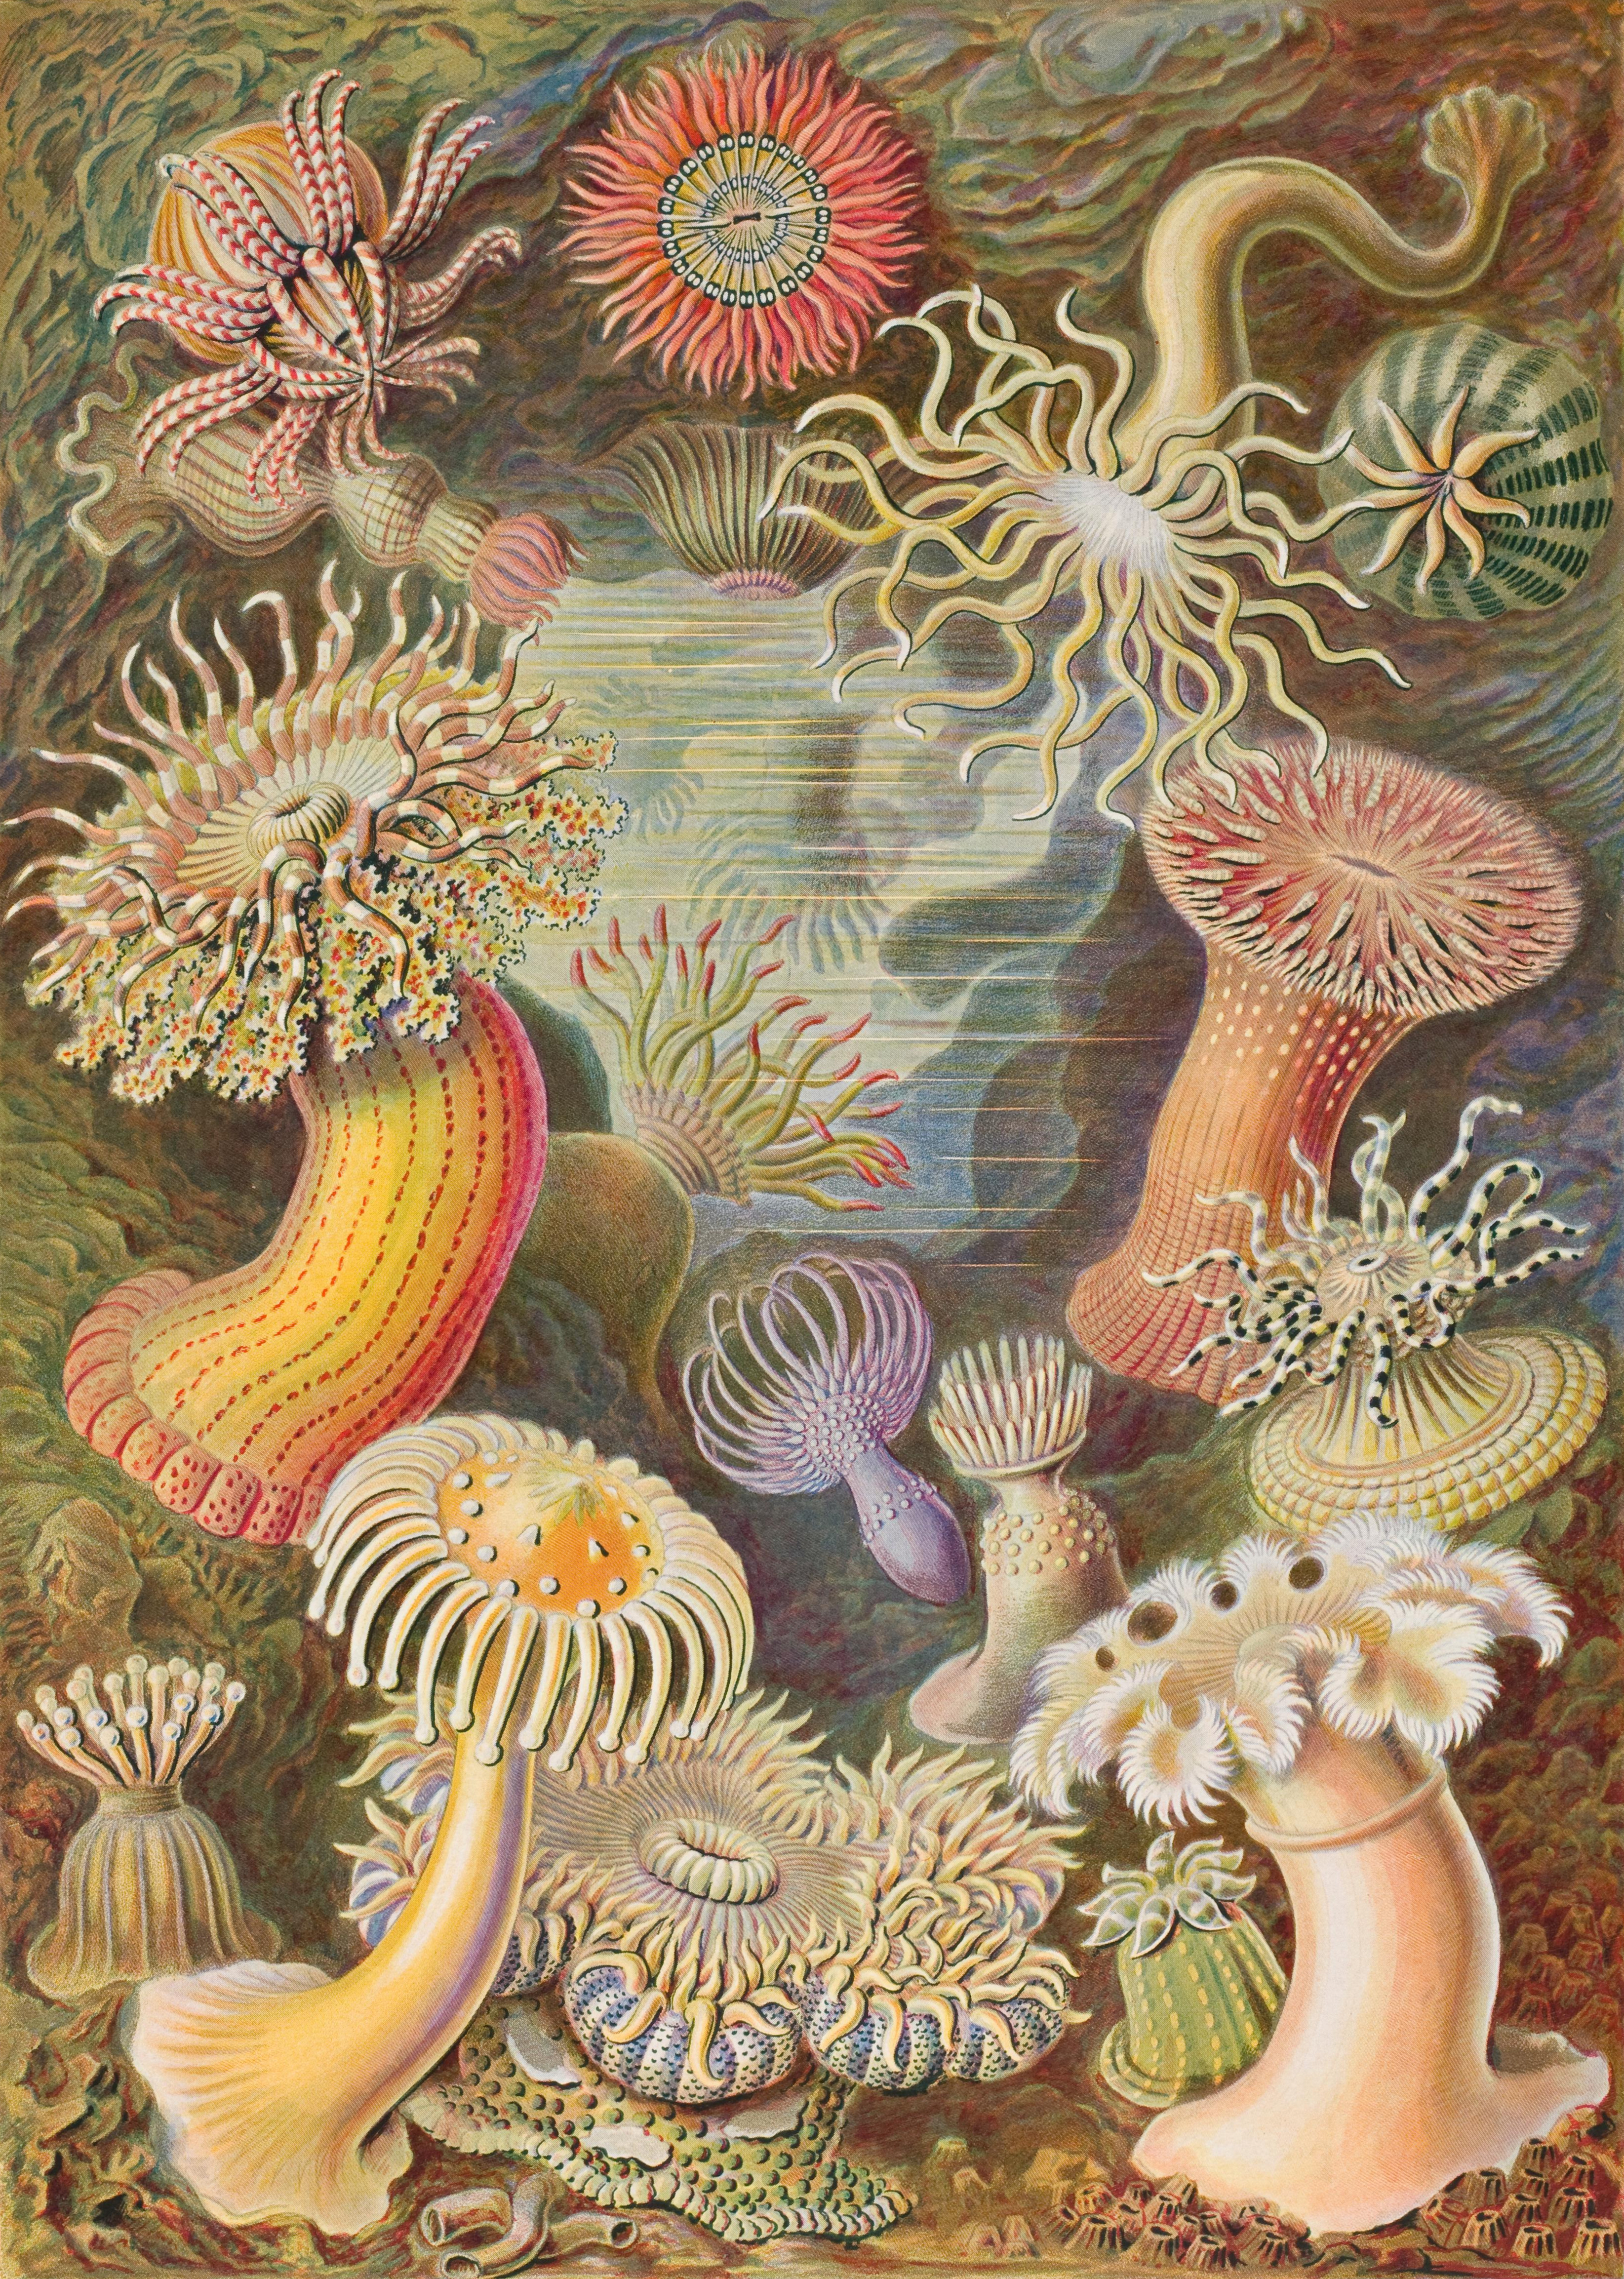 Ernst Haeckel Origen De La Vida Ilustraciones Taringa